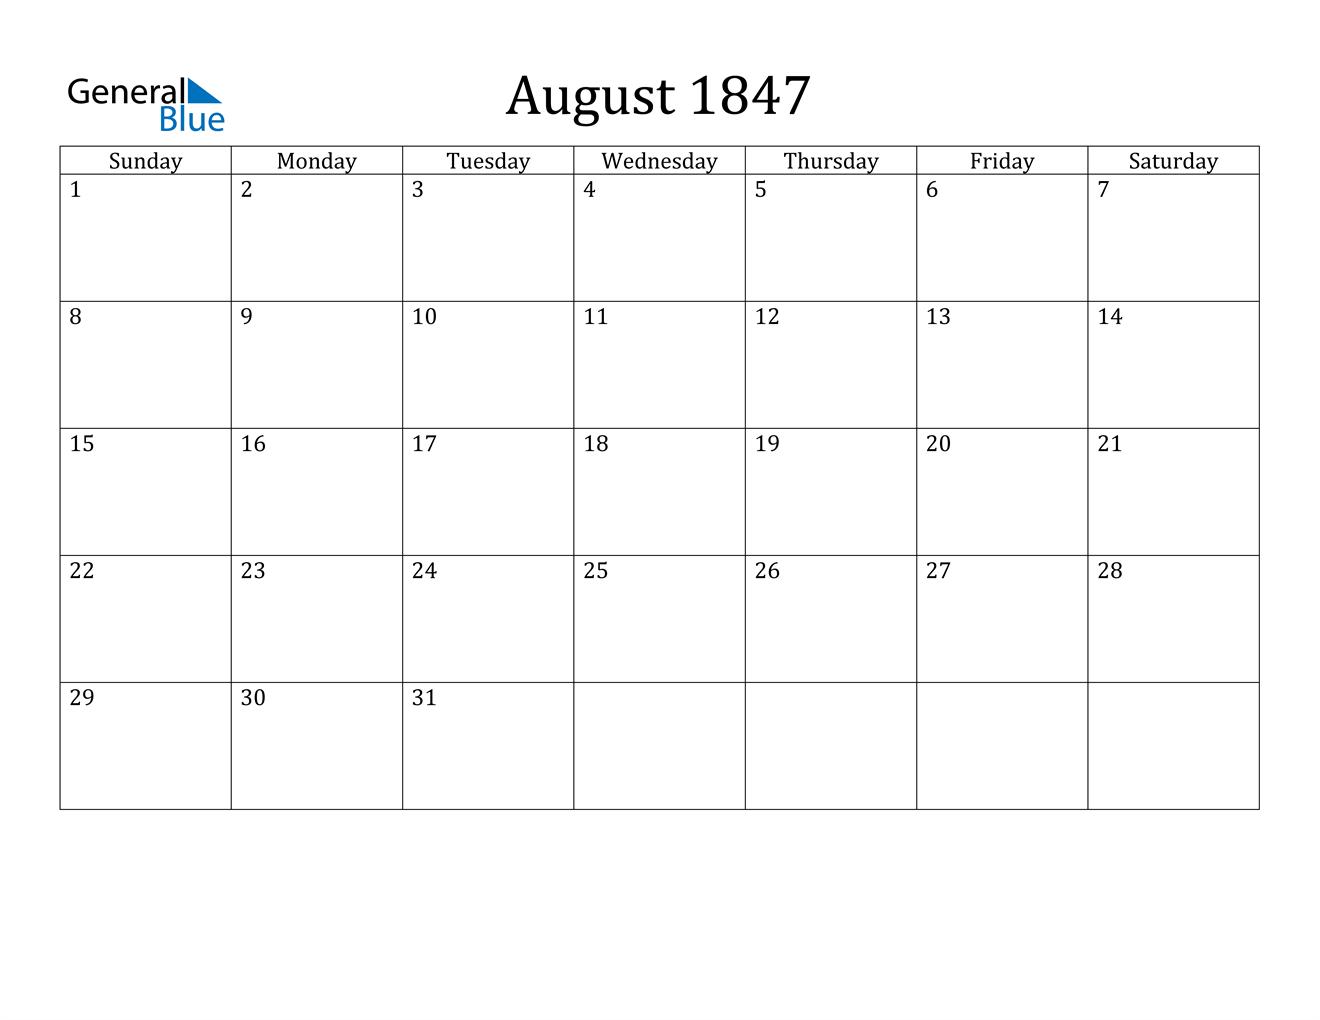 Image of August 1847 Calendar